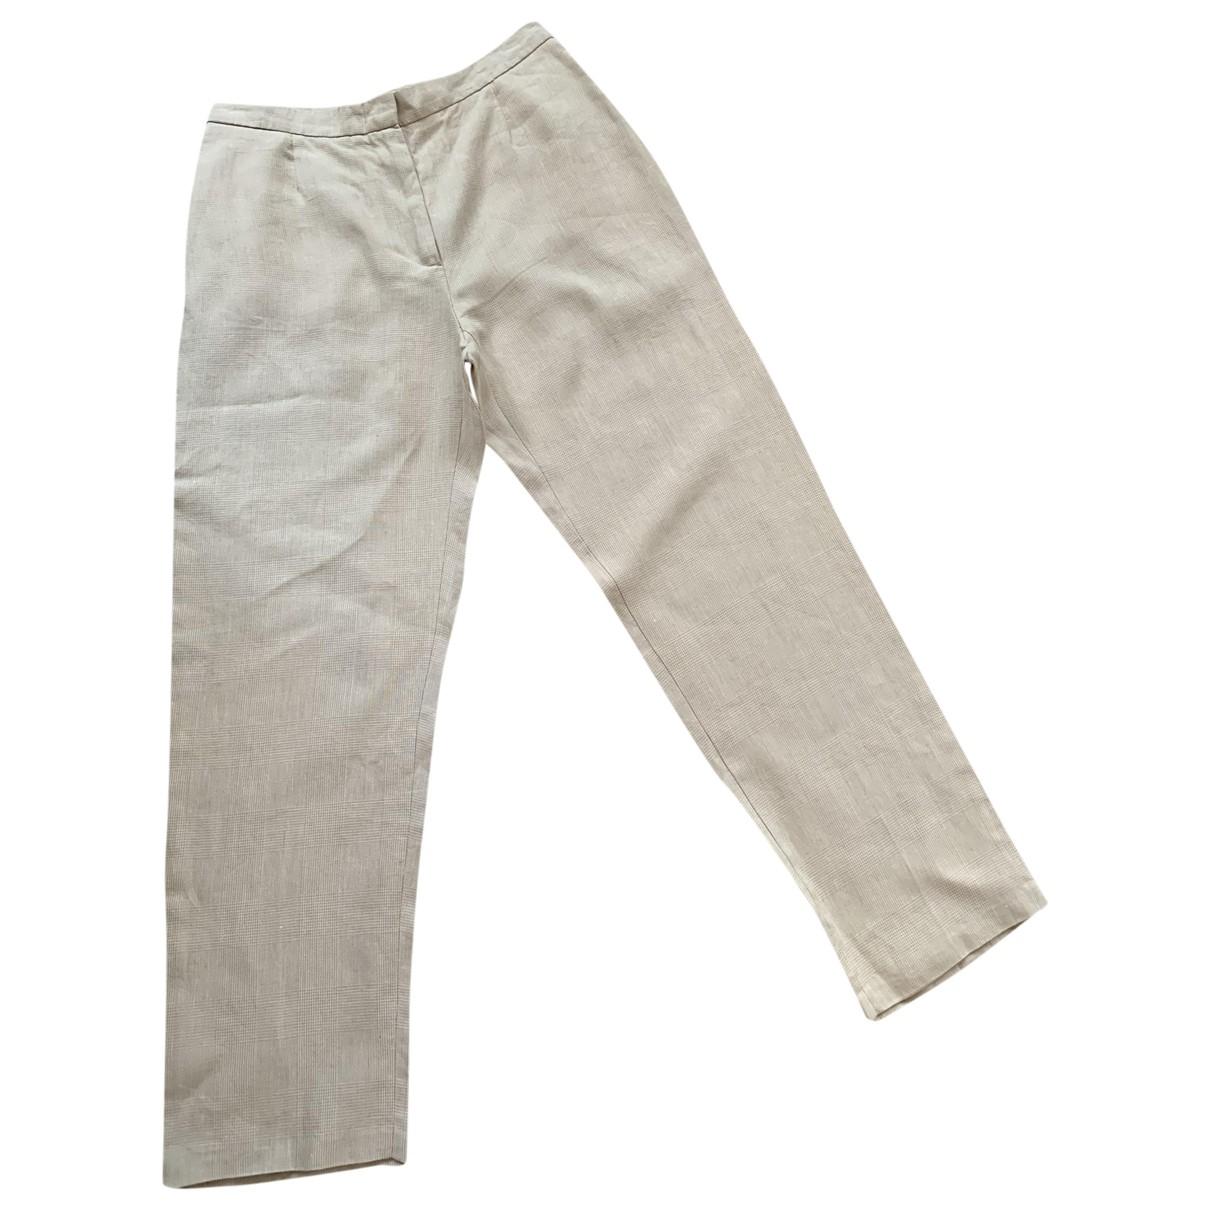 Max Mara \N Beige Linen Trousers for Women 44 FR